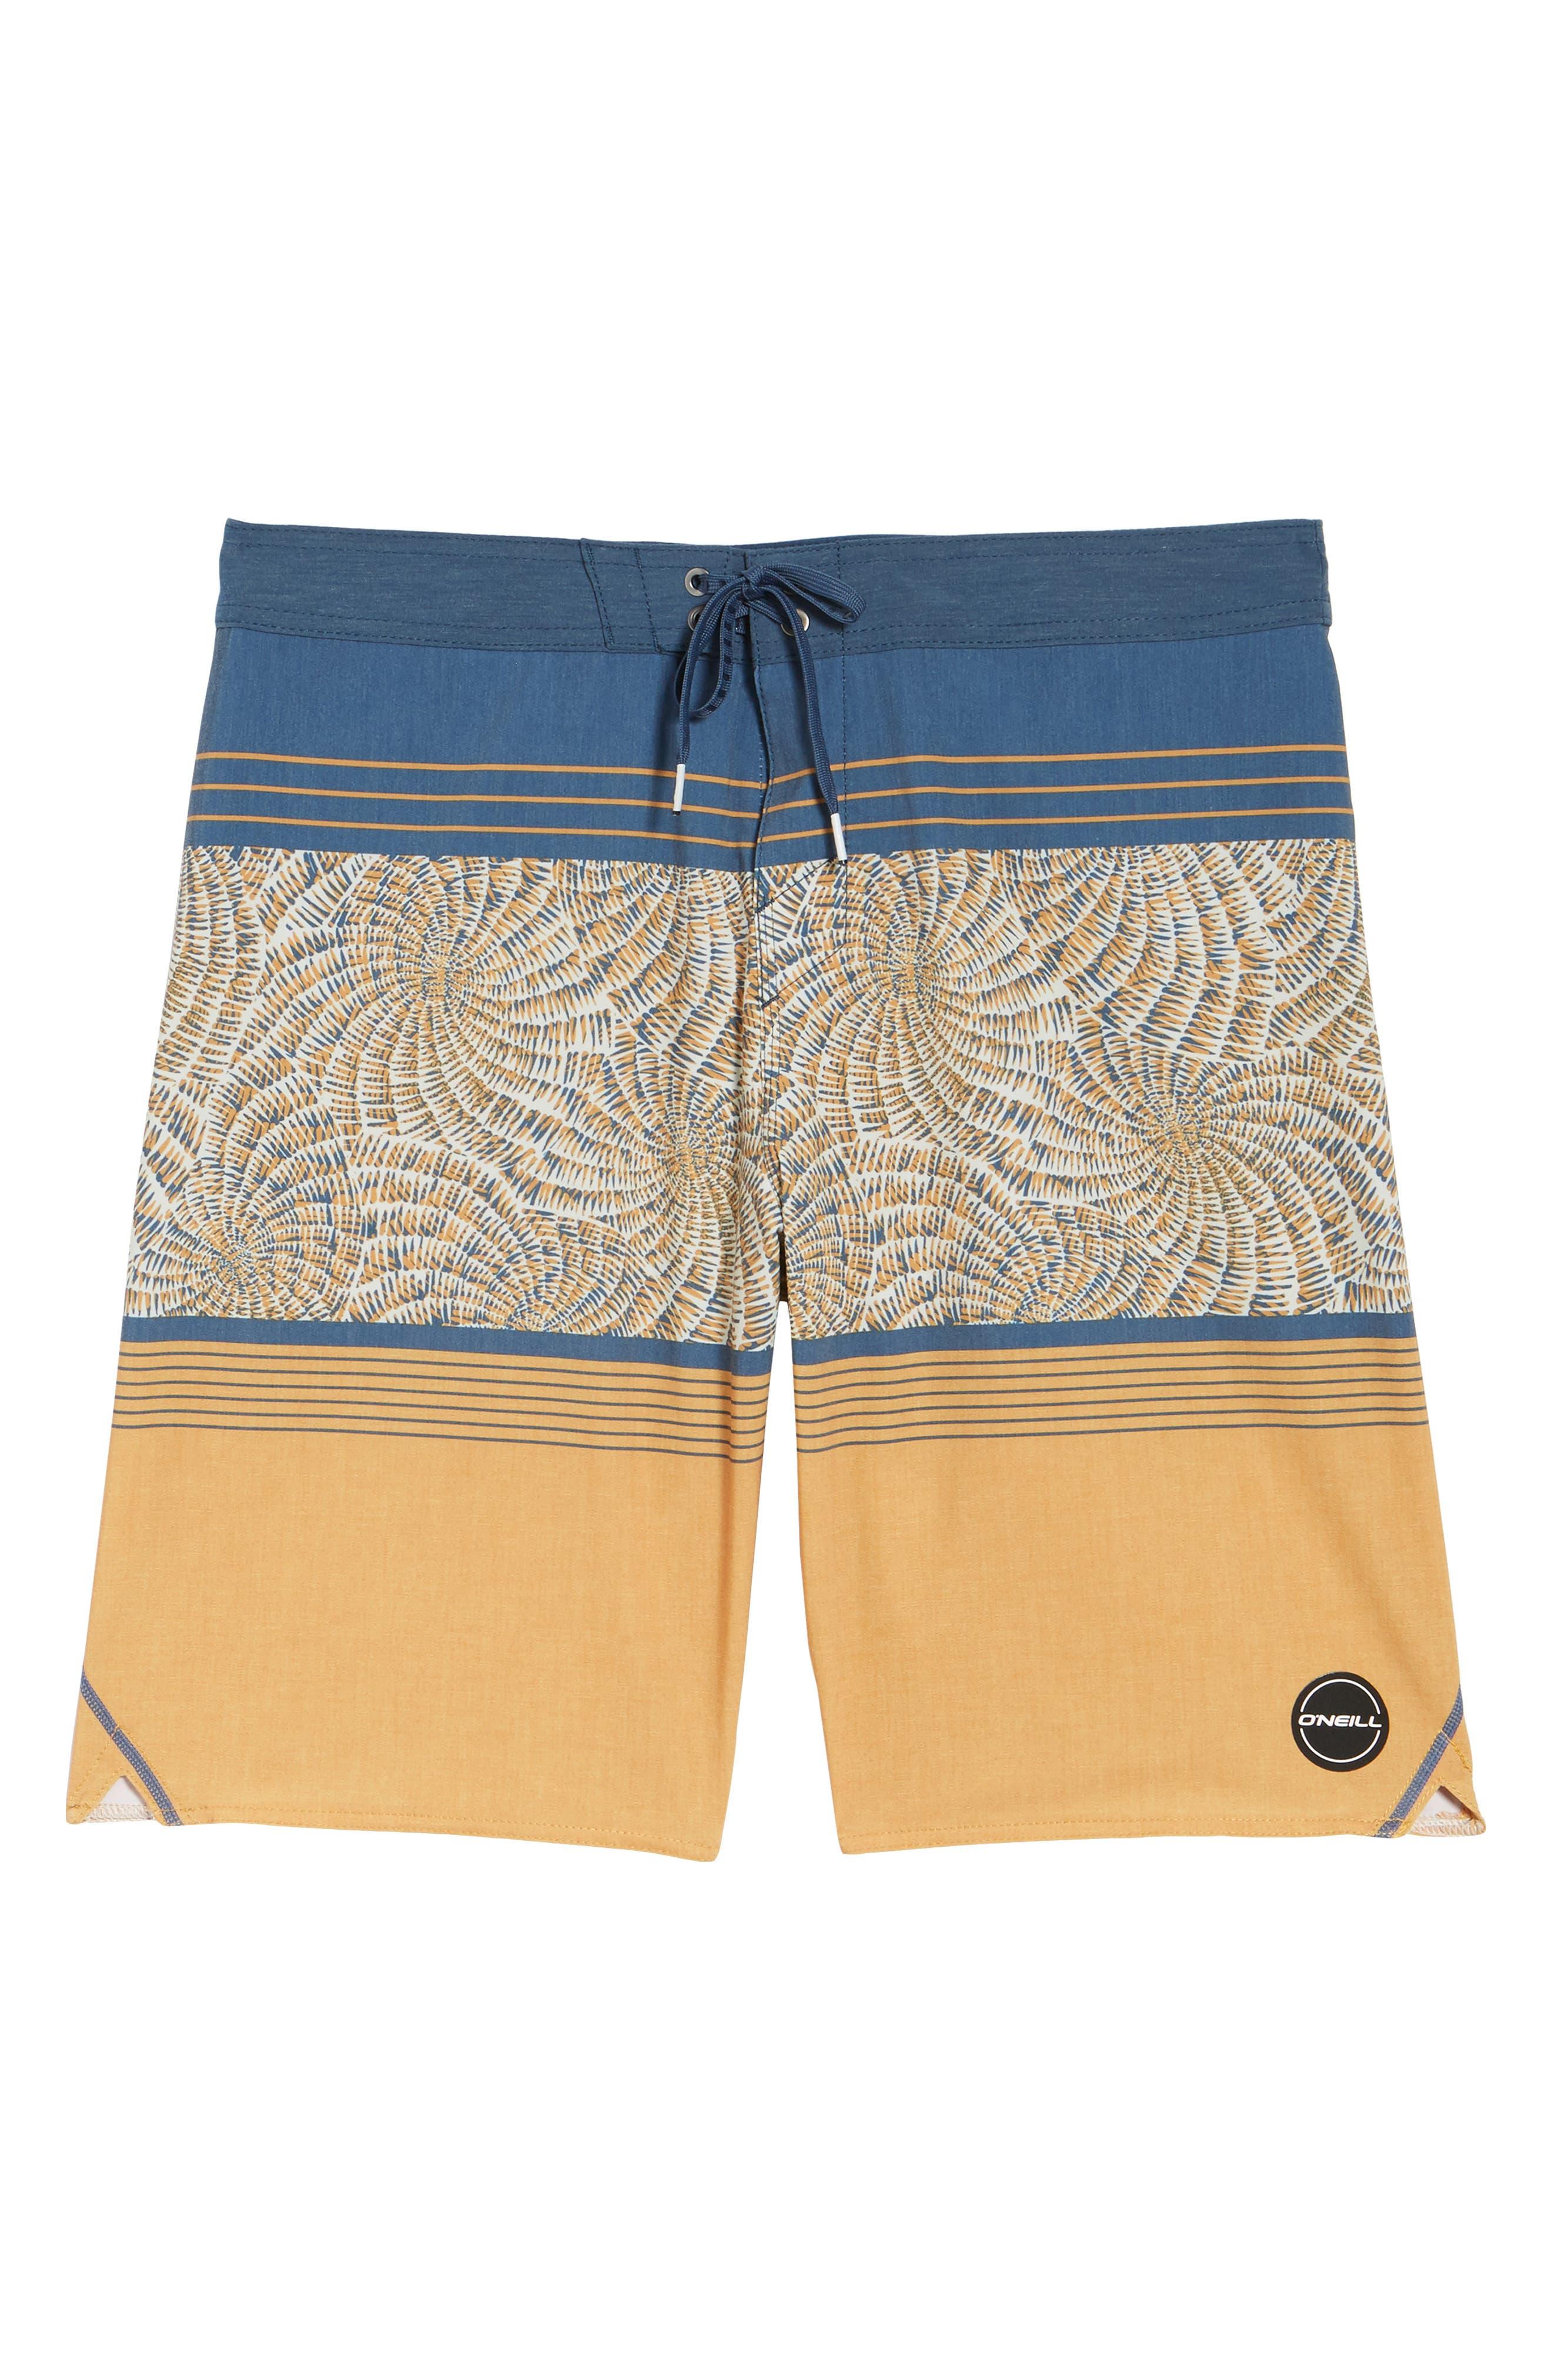 Hyperfreak Nautilus S-Seam Board Shorts,                             Alternate thumbnail 6, color,                             709